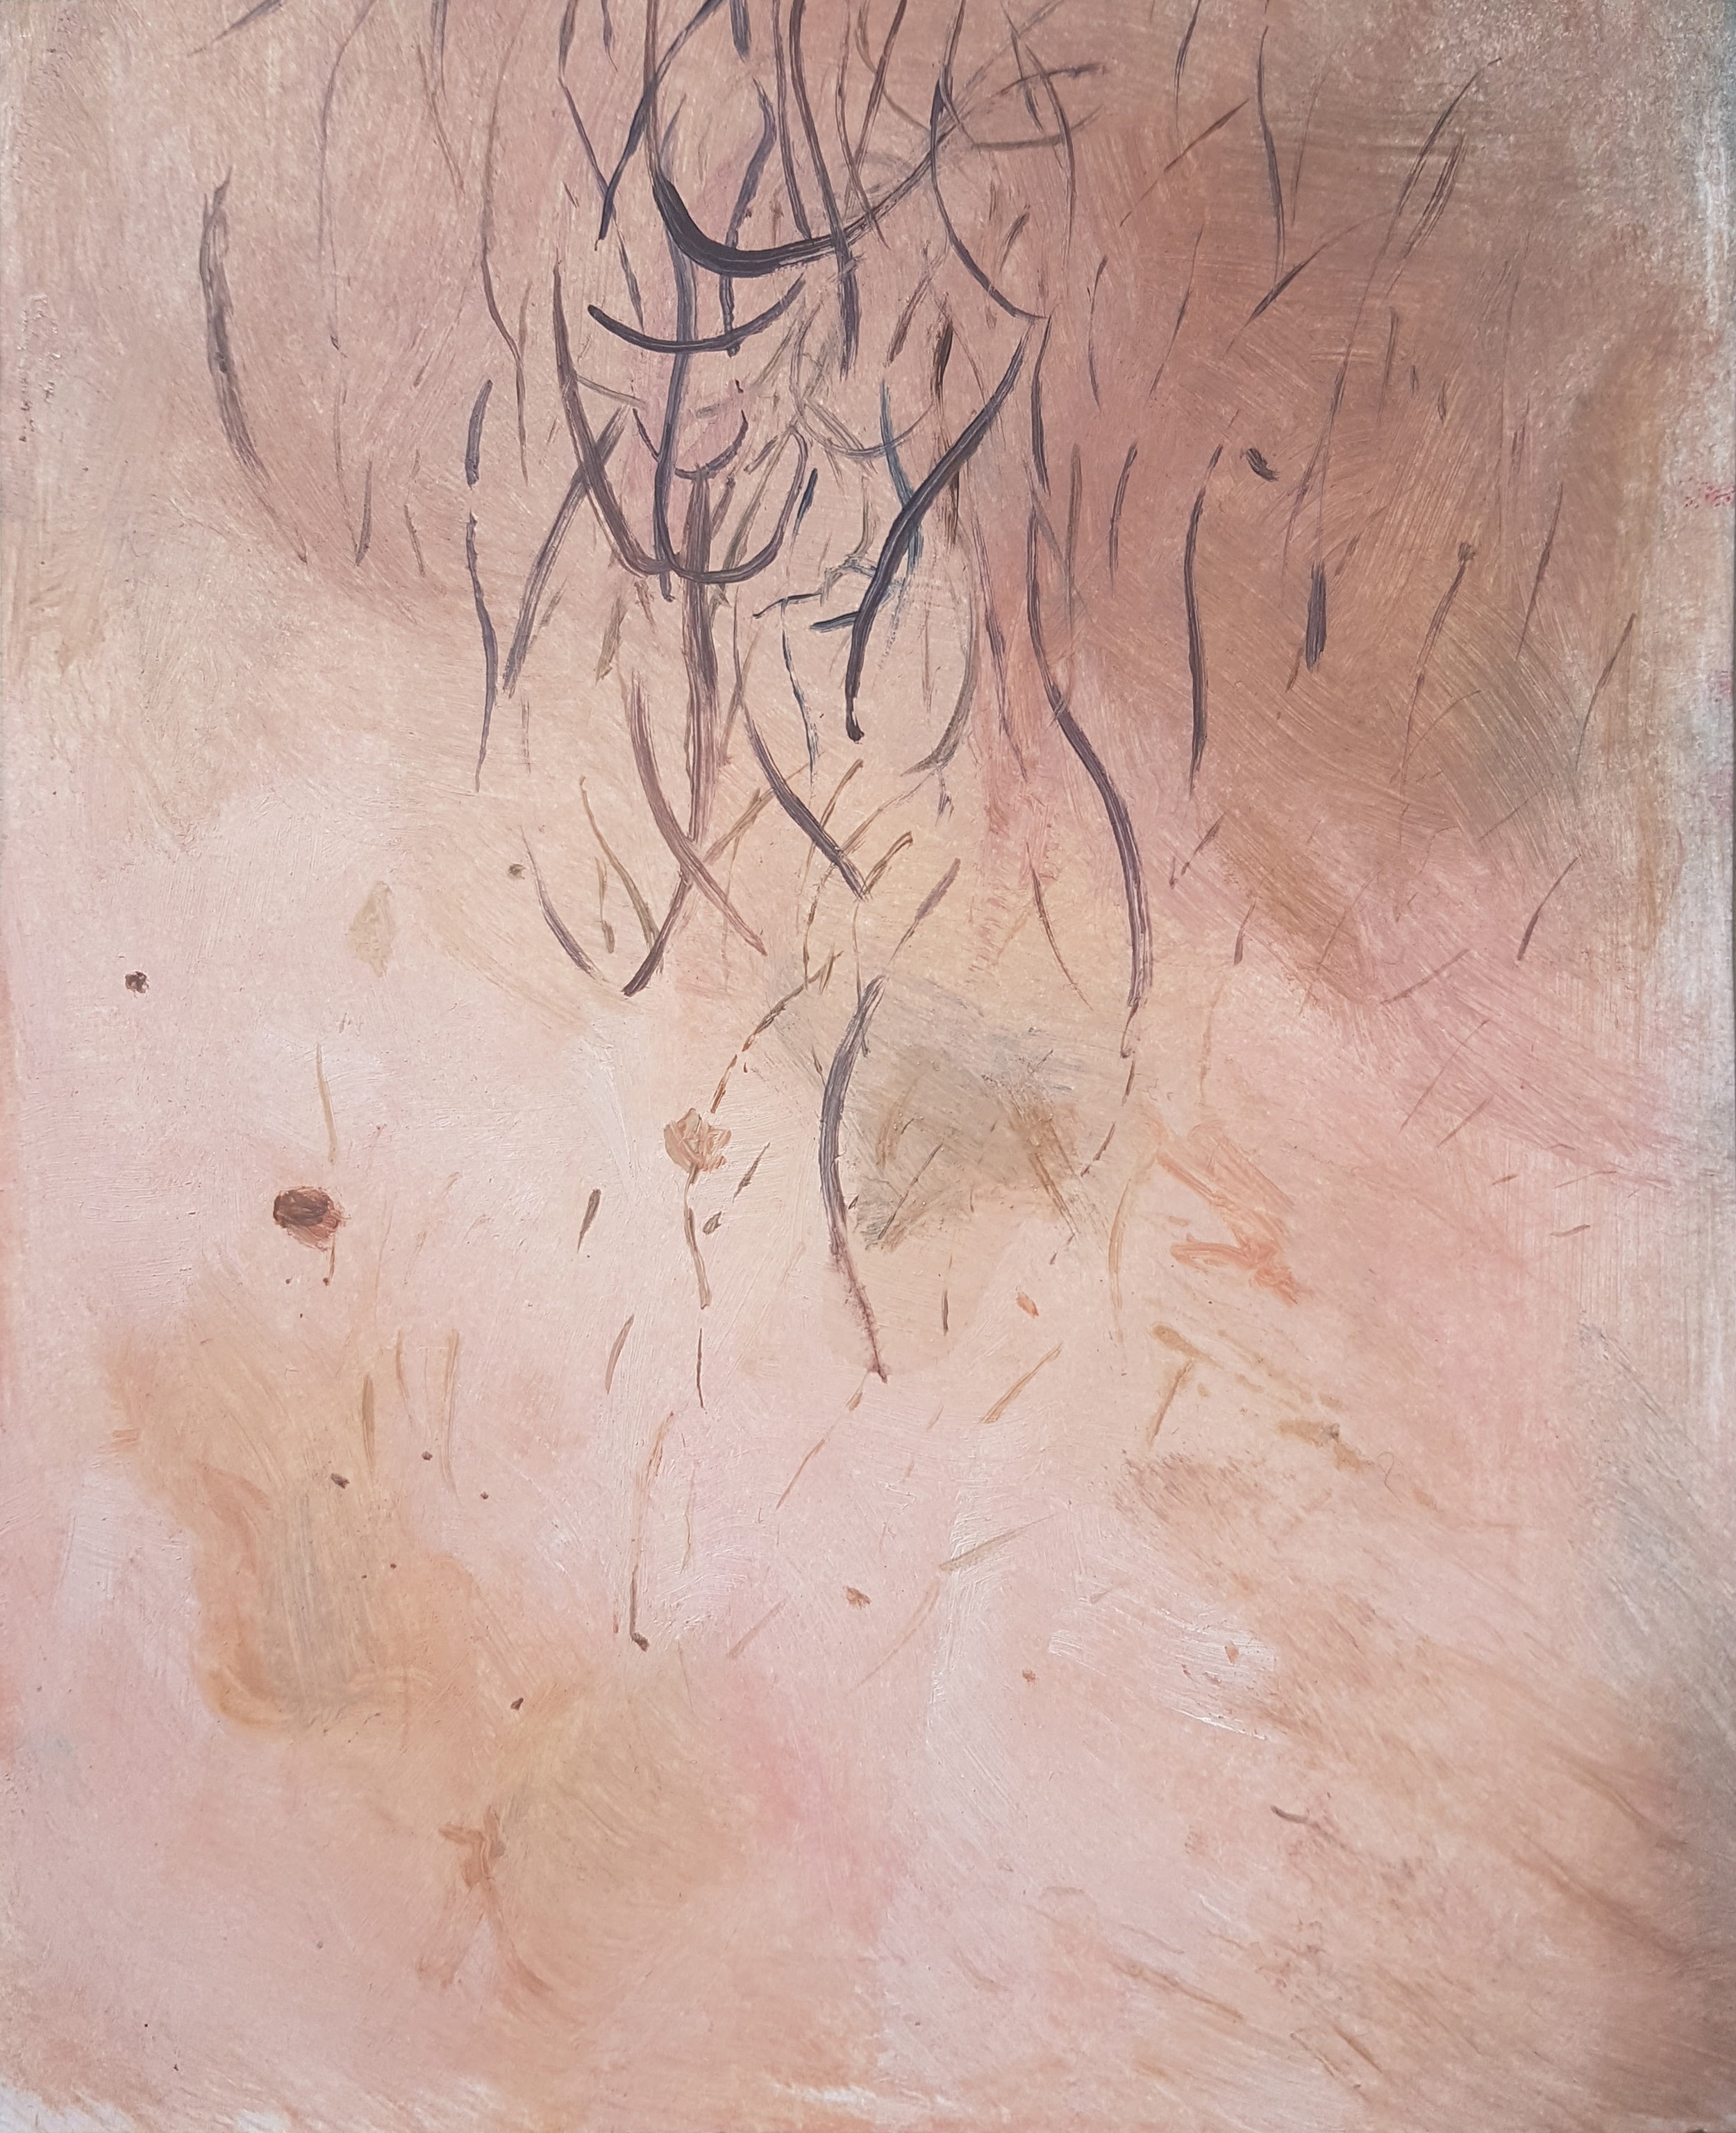 Self Portrait, oil on paper, 2017